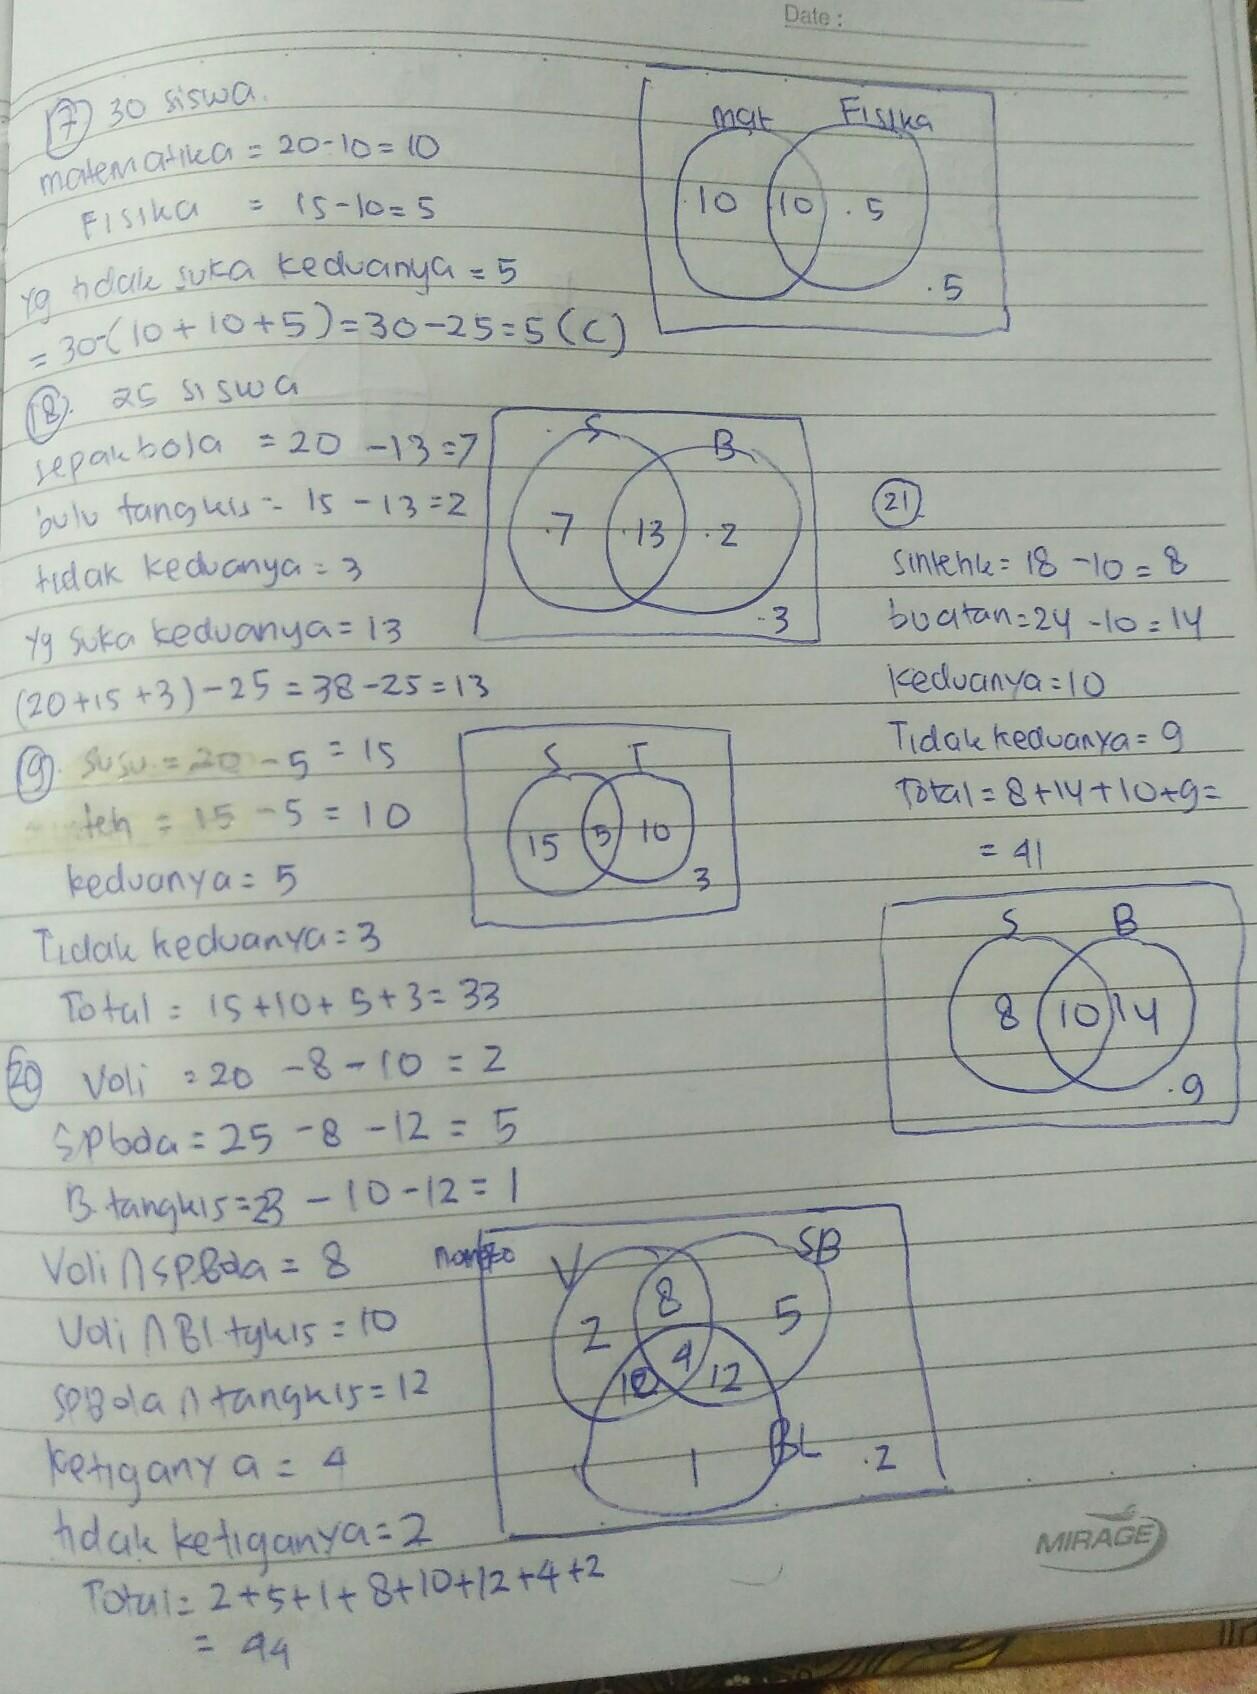 Jawaban Dari Buku Paket Matematika Kelas 7 Semester 1 Halaman 188 189 Nomor 17 21 Soal No 17 21 Brainly Co Id